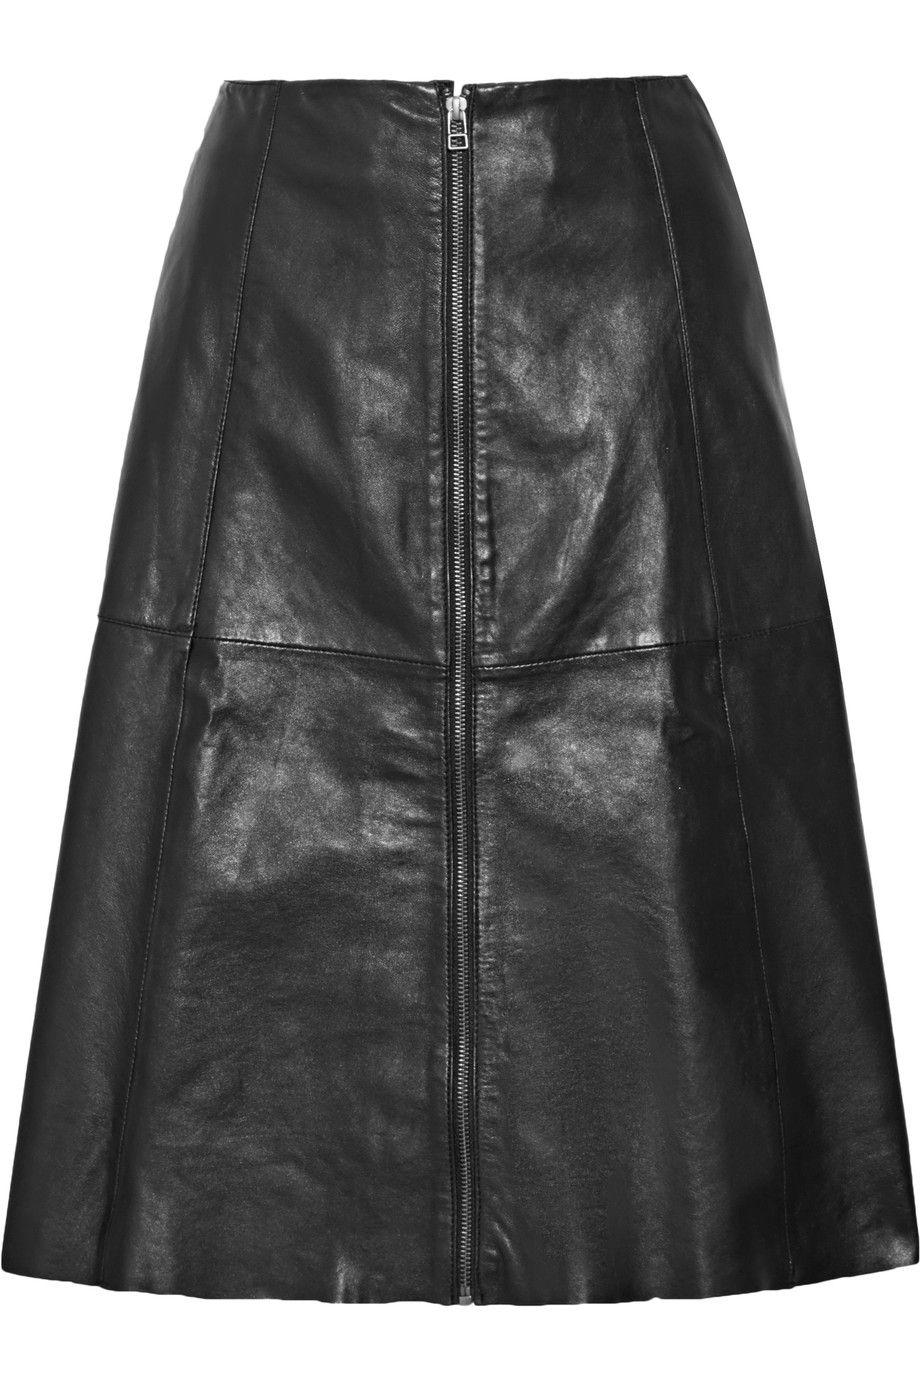 ede44d1d4 MUUBAA . #muubaa #cloth #skirt   Muubaa   Leather skirt, Black ...